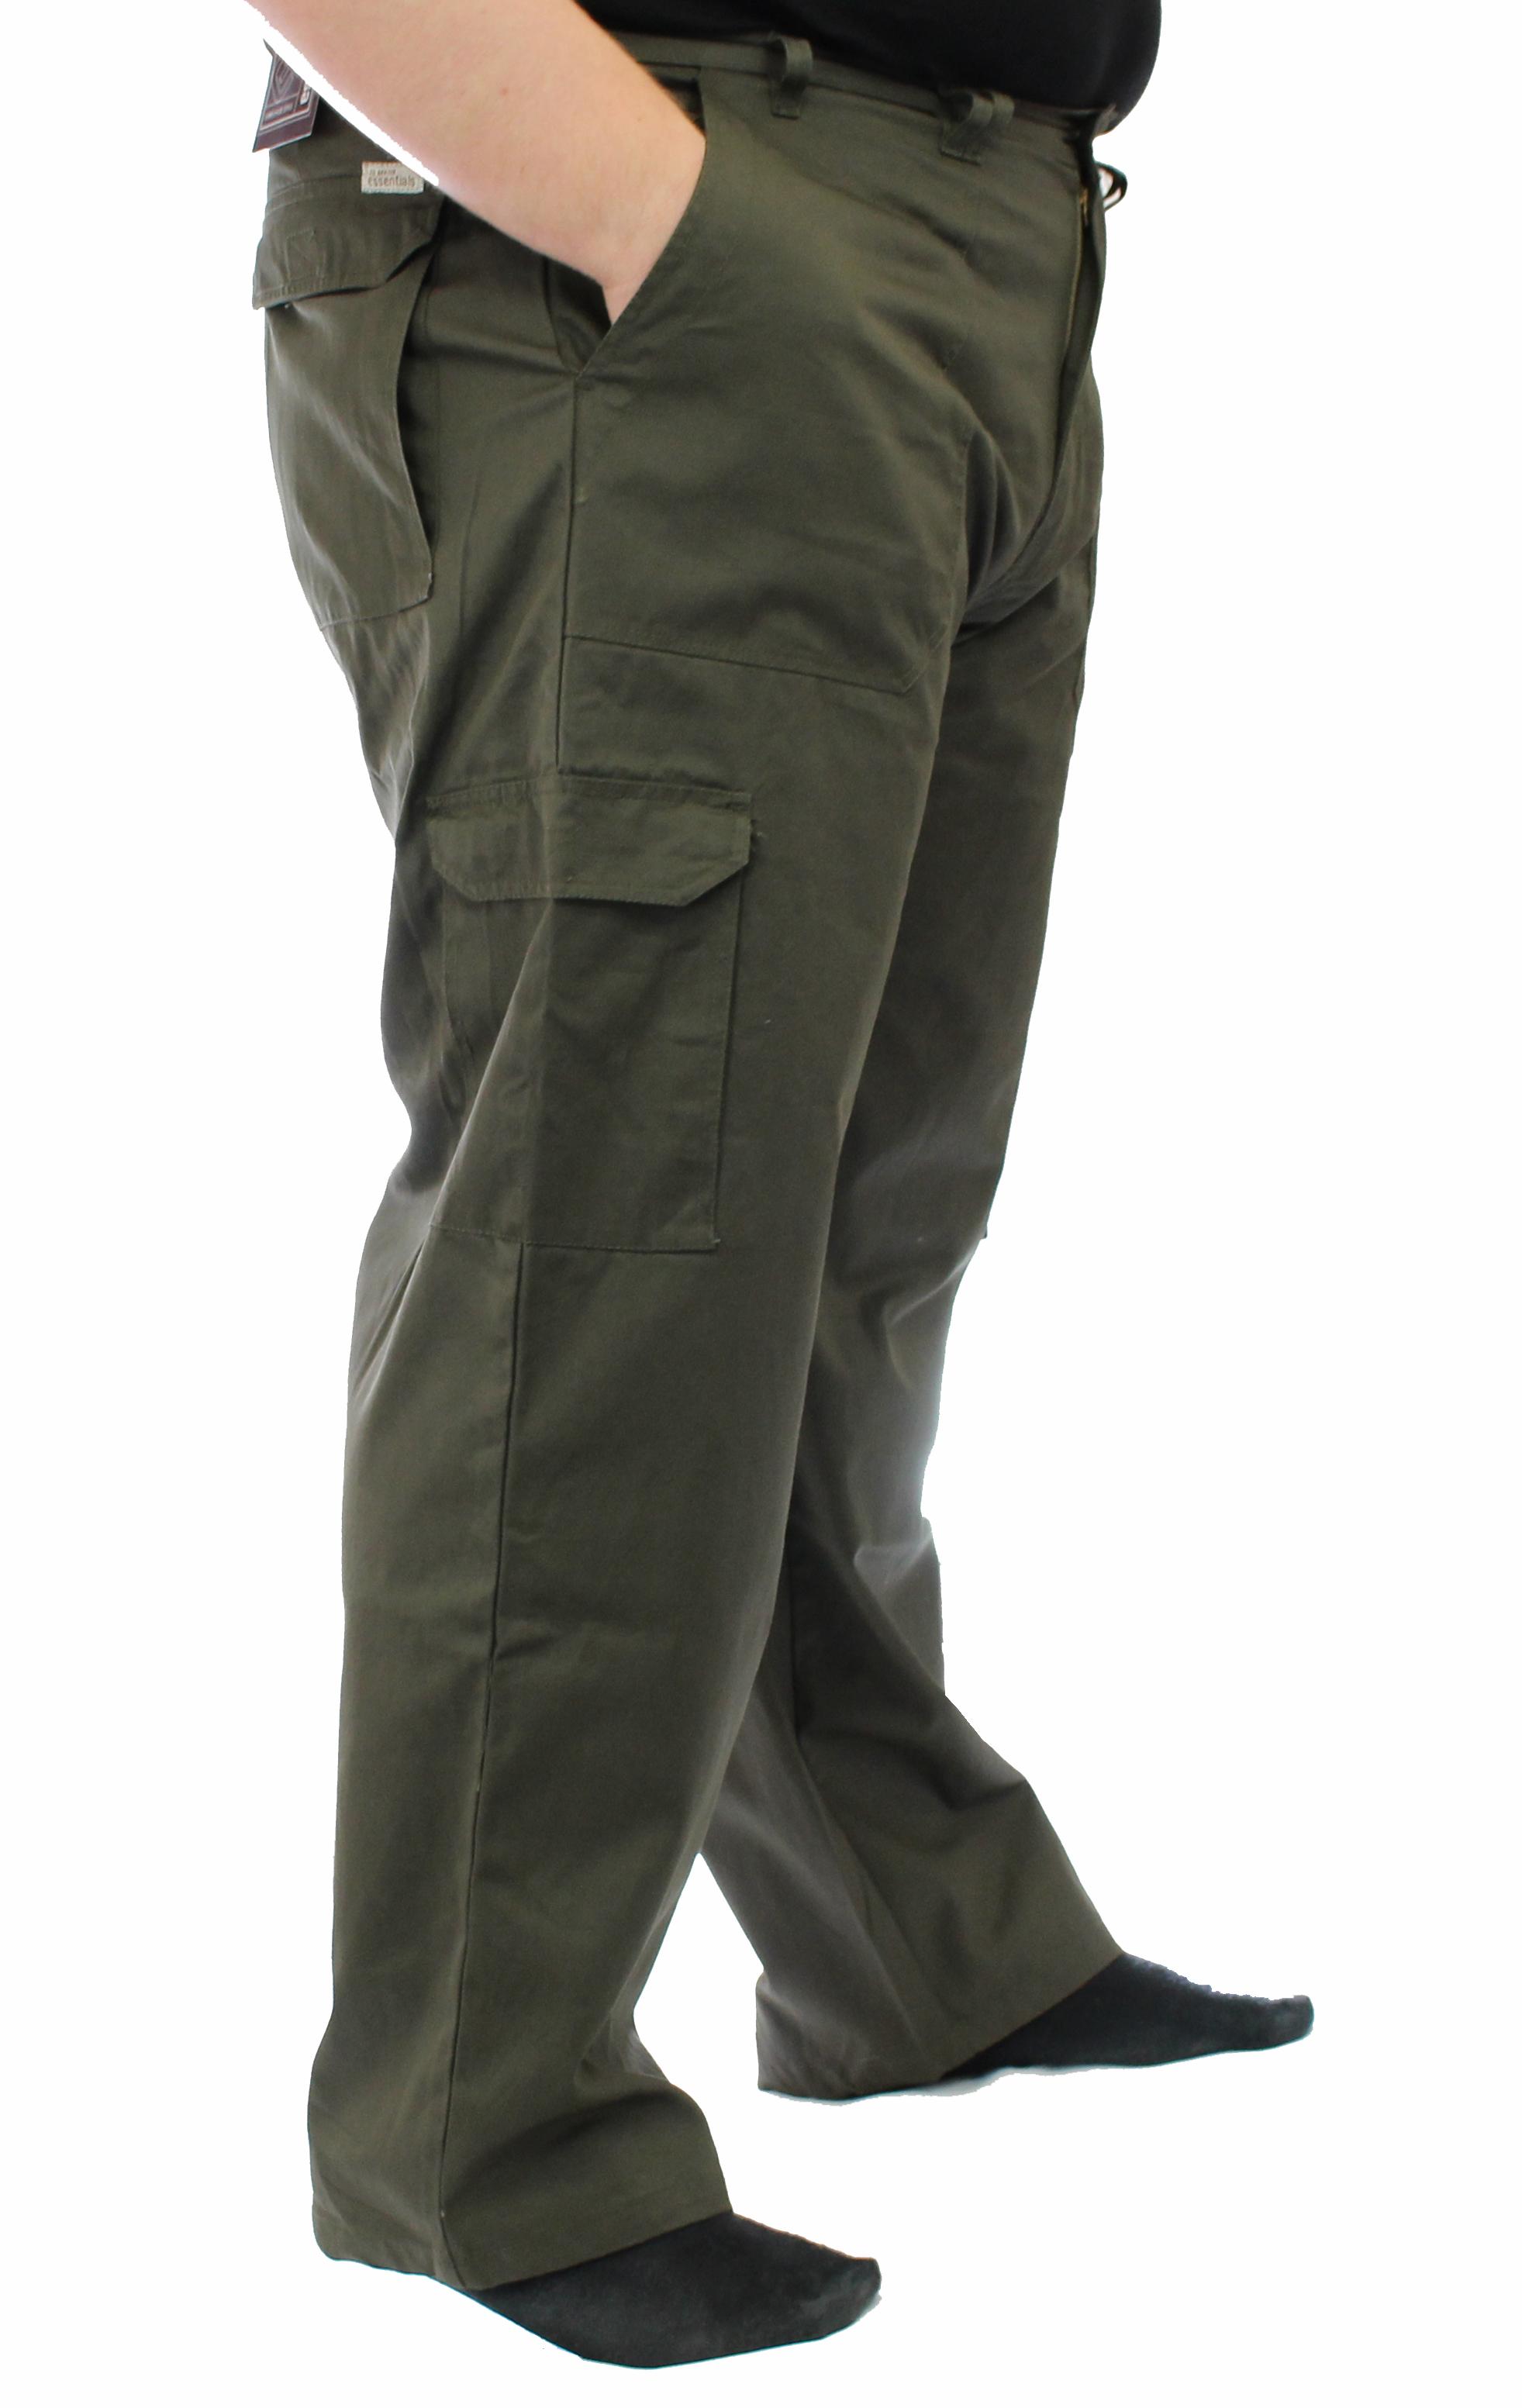 "Ed Baxter Victory - Heavy Duty Cargo Combat Trousers - Khaki - 64"" Waist, 34"" Leg"